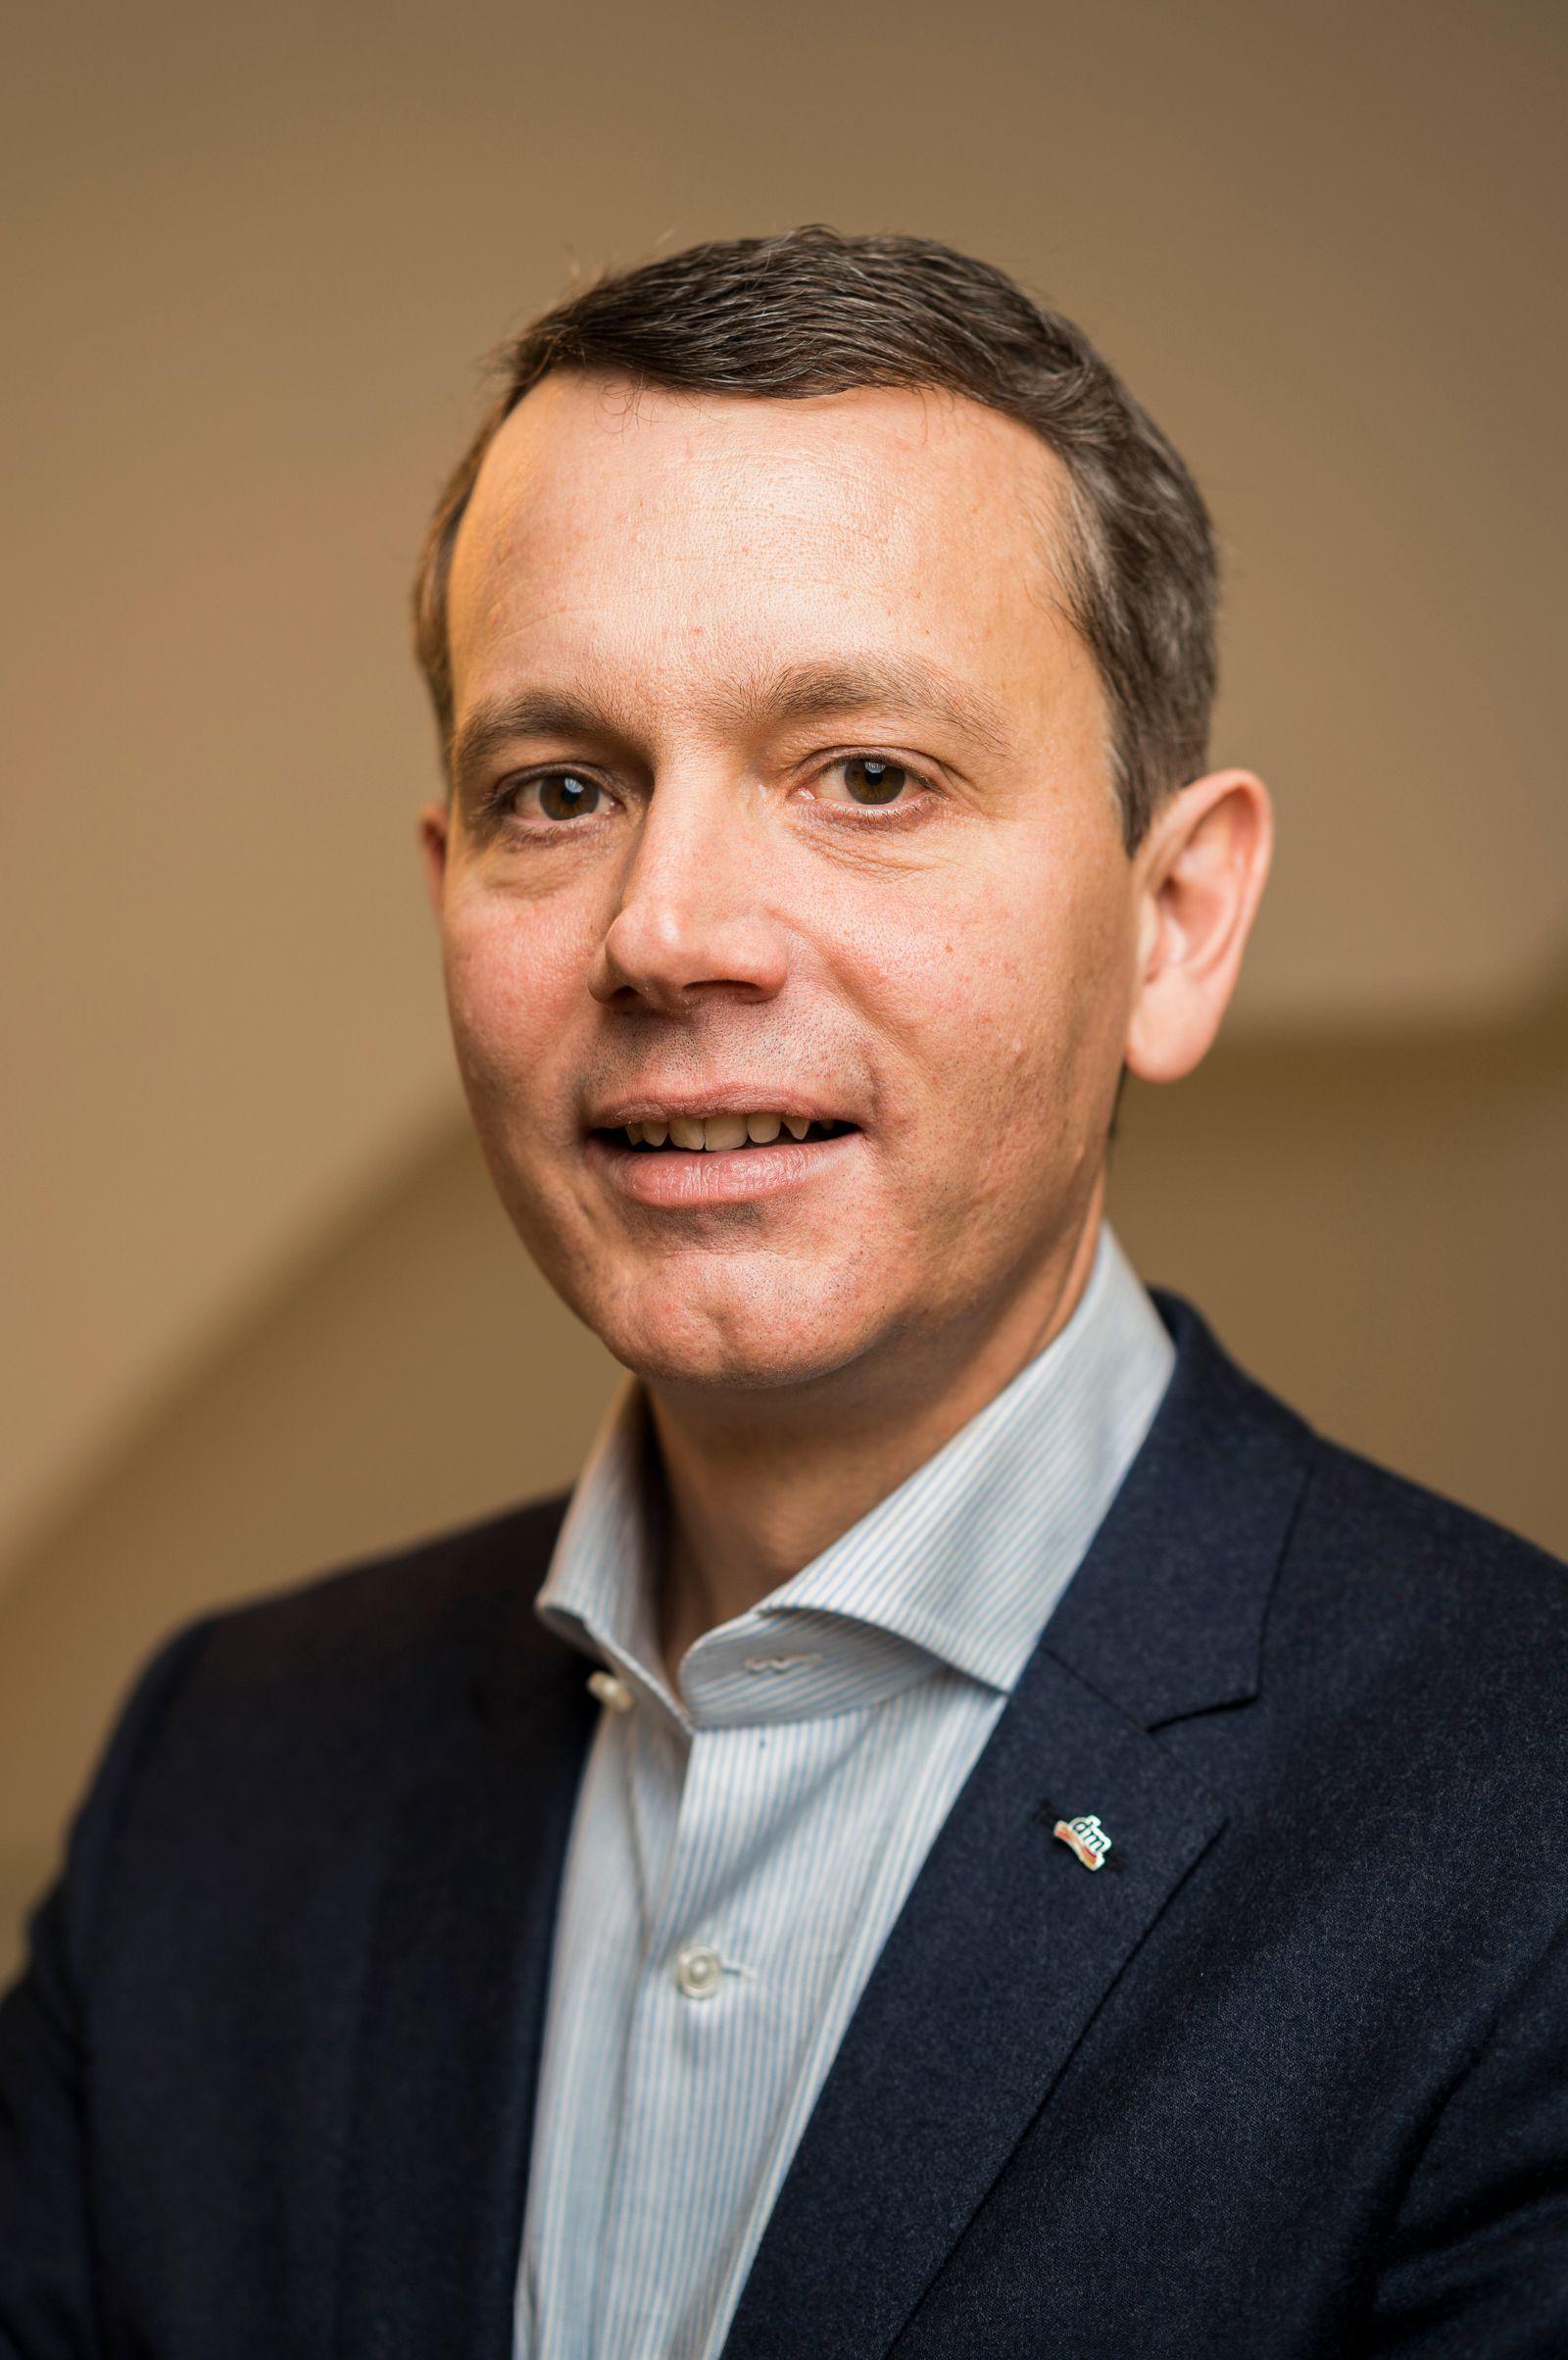 dm Chef Christoph Werner